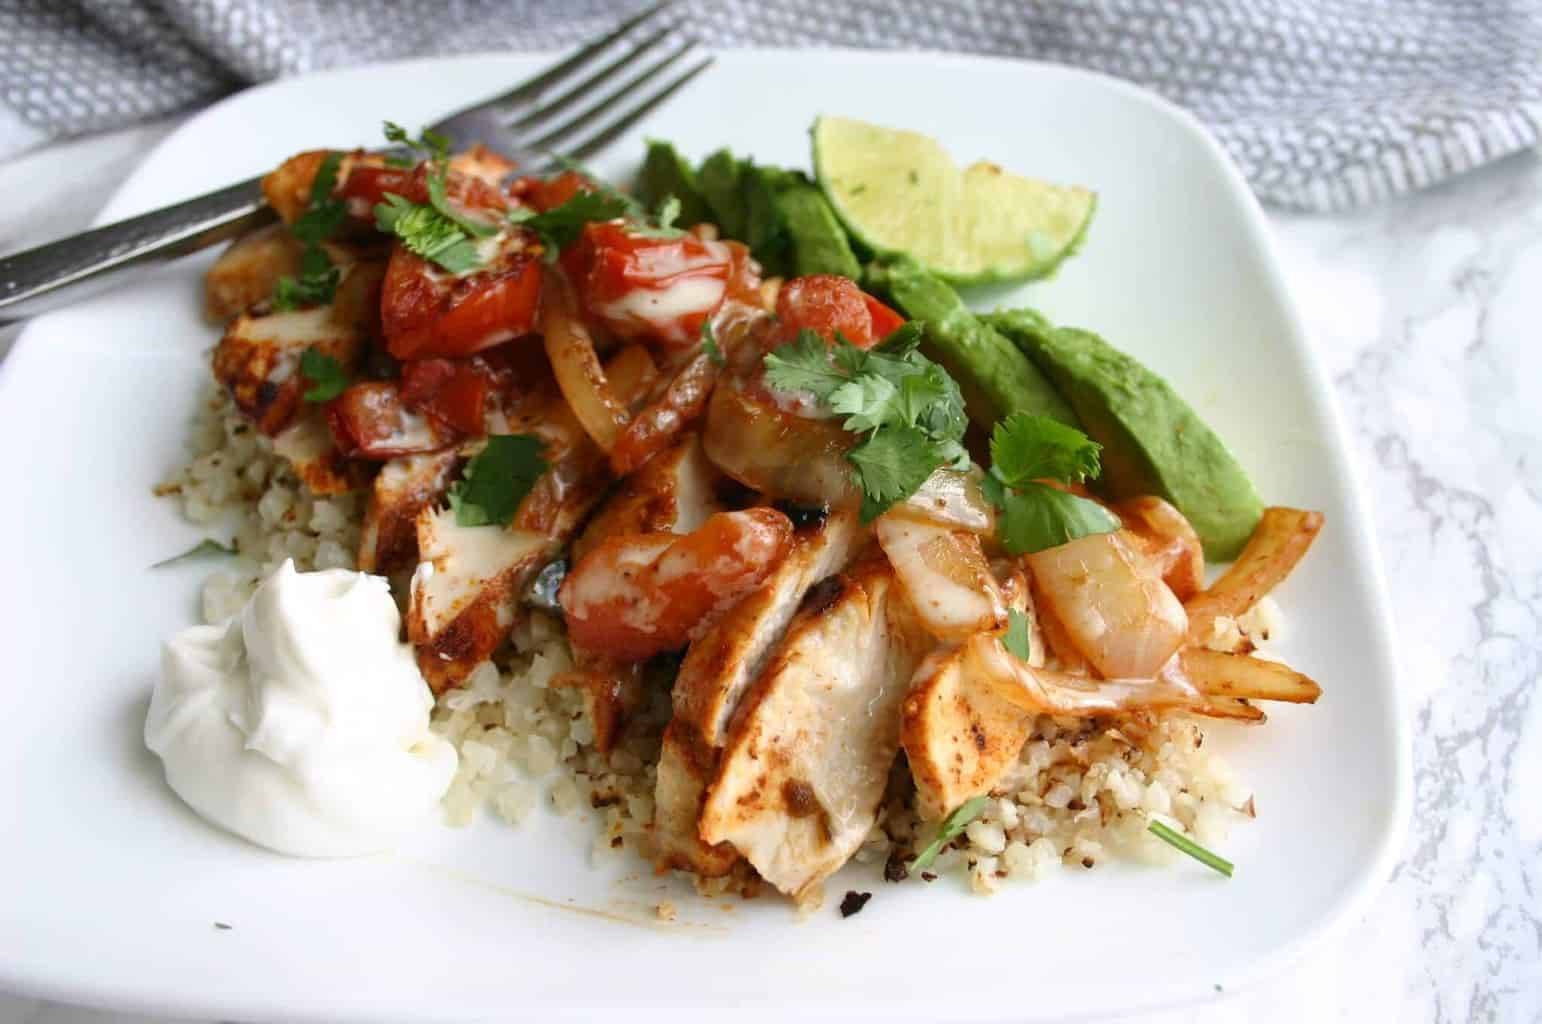 Low carb cauliflower rice recipes - Mexican fajita chicken over cauliflower rice!